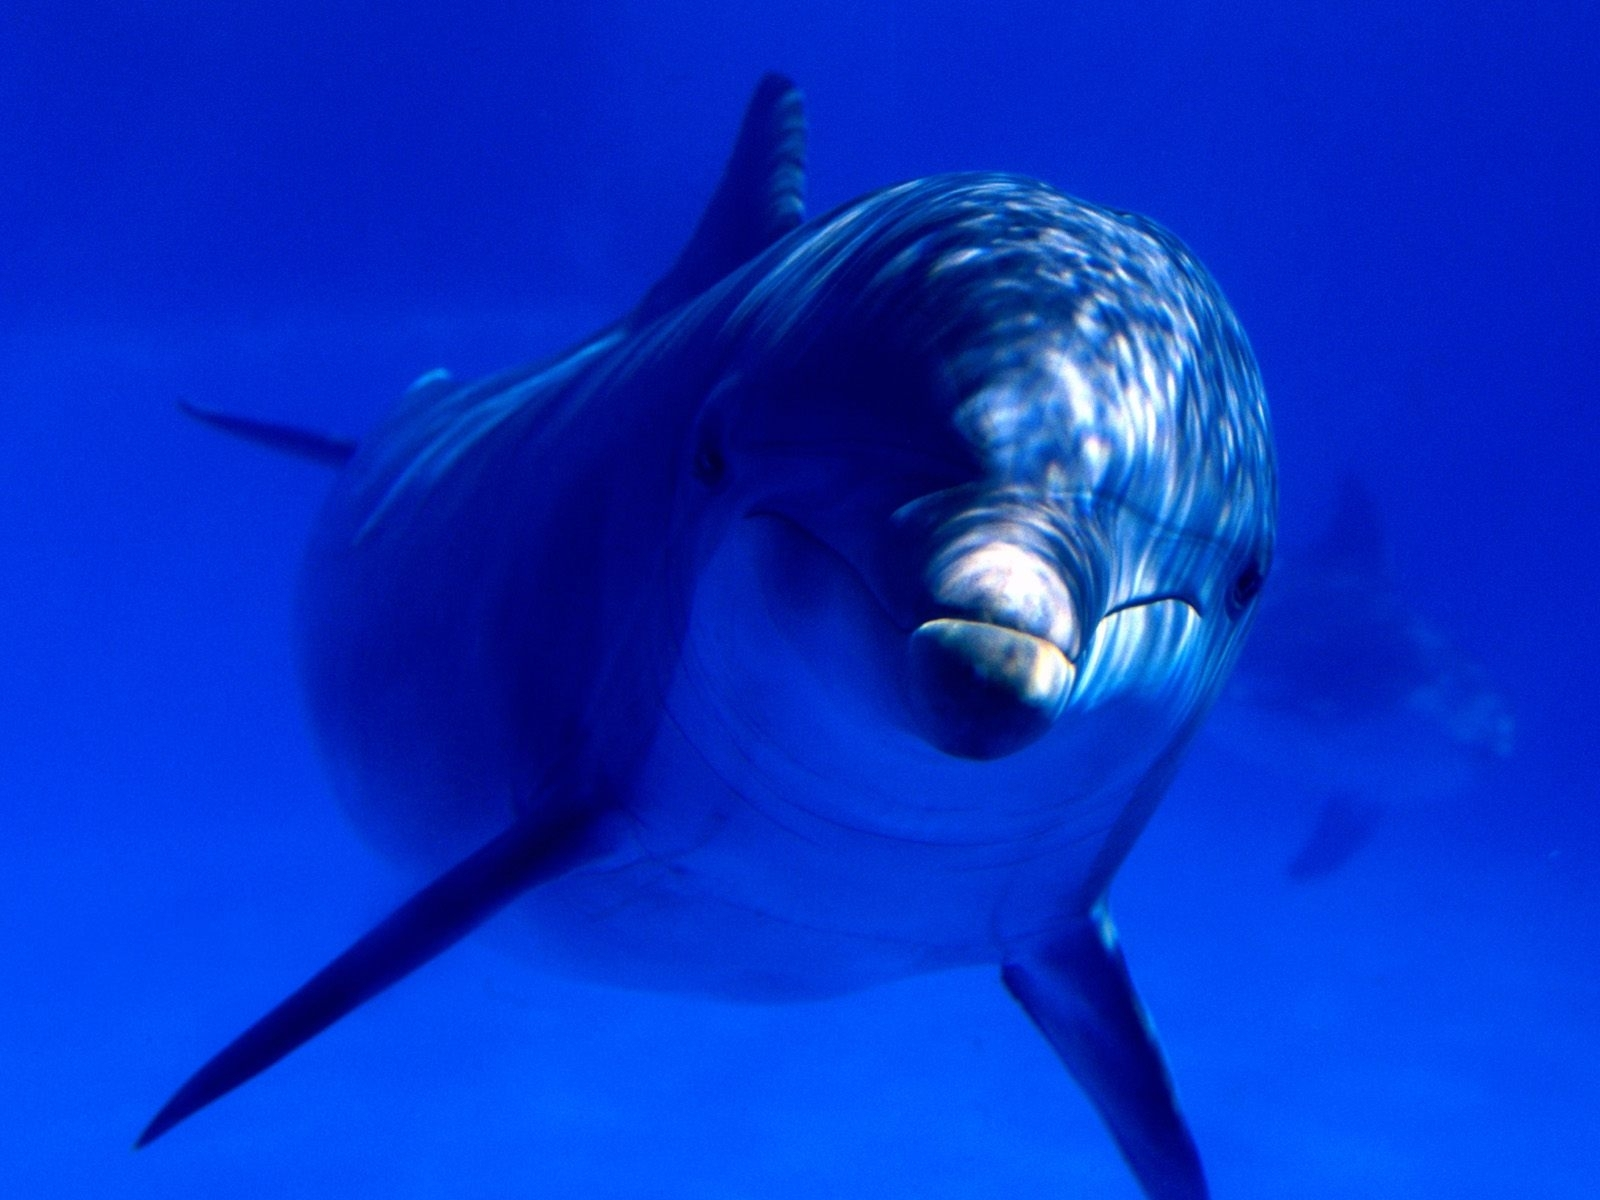 Handy-Wallpaper Delfine, Tiere kostenlos herunterladen.